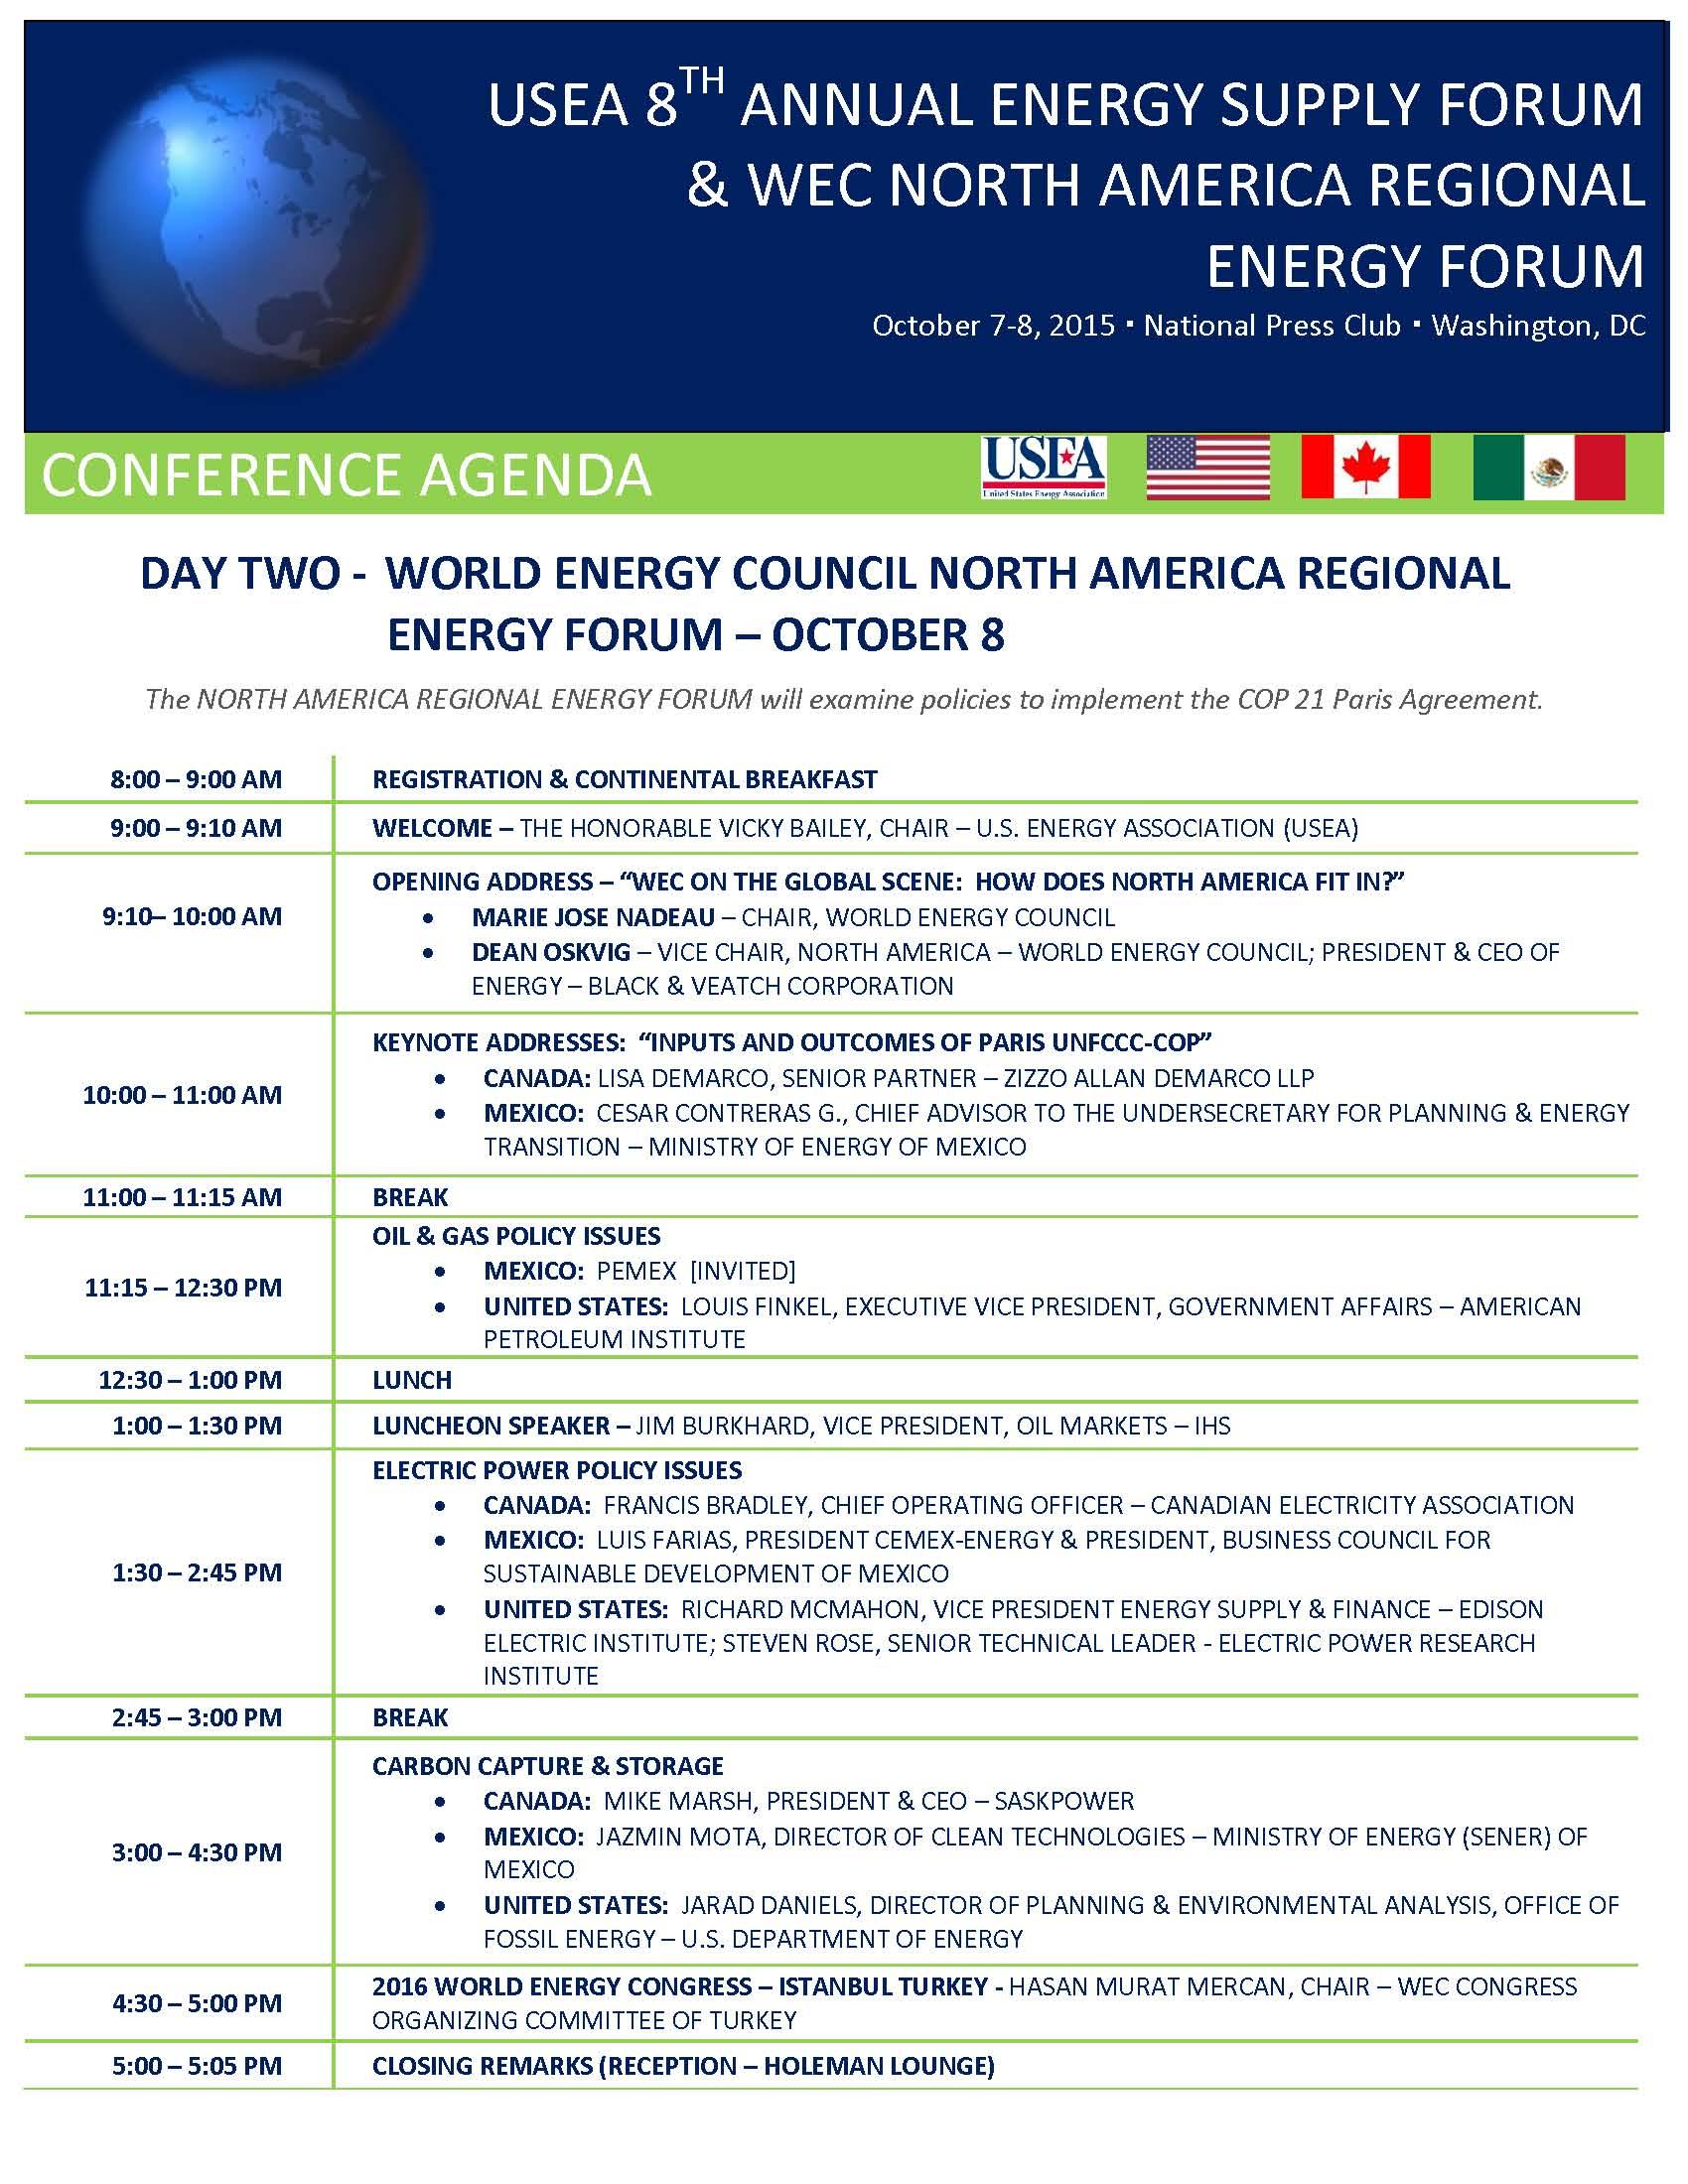 USEA 8th Annual Energy Supply Forum WEC North America Regional – Event Agendas